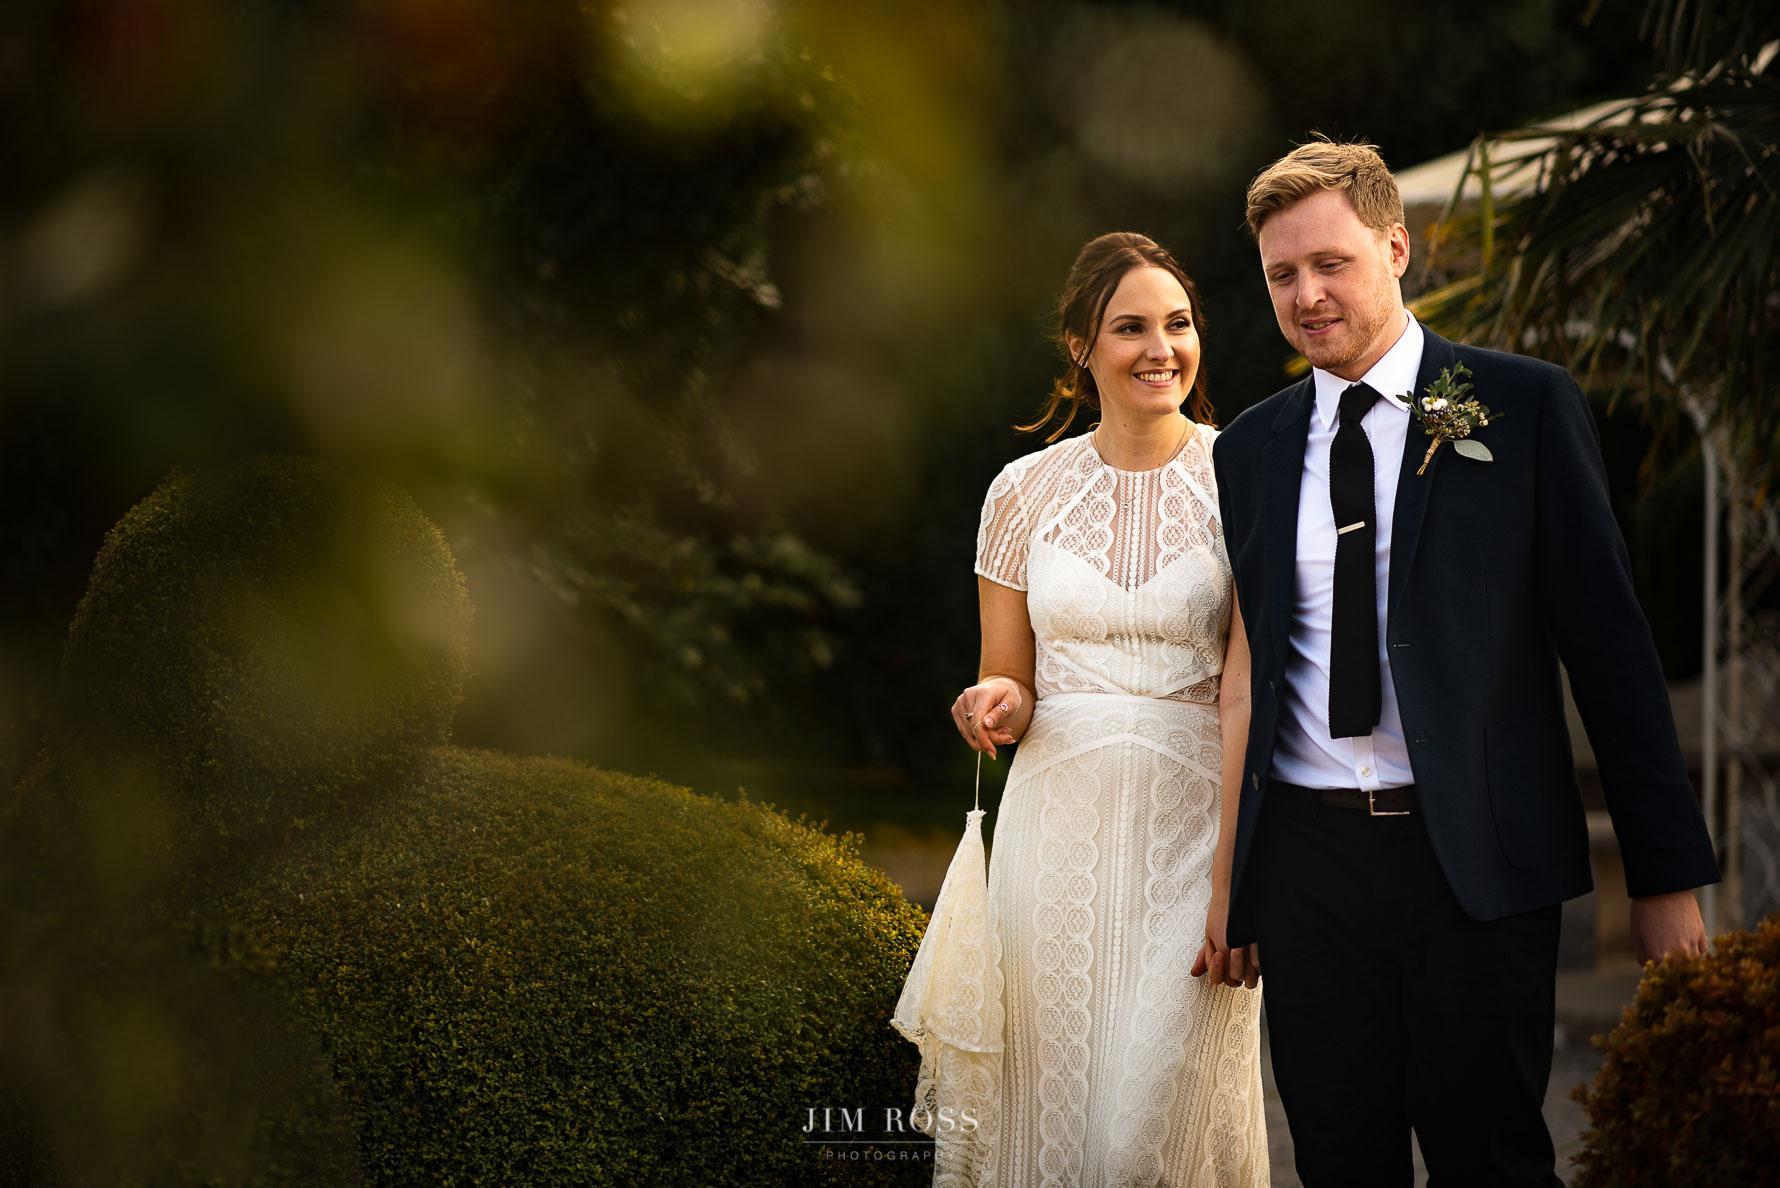 Lancashire wedding portrait